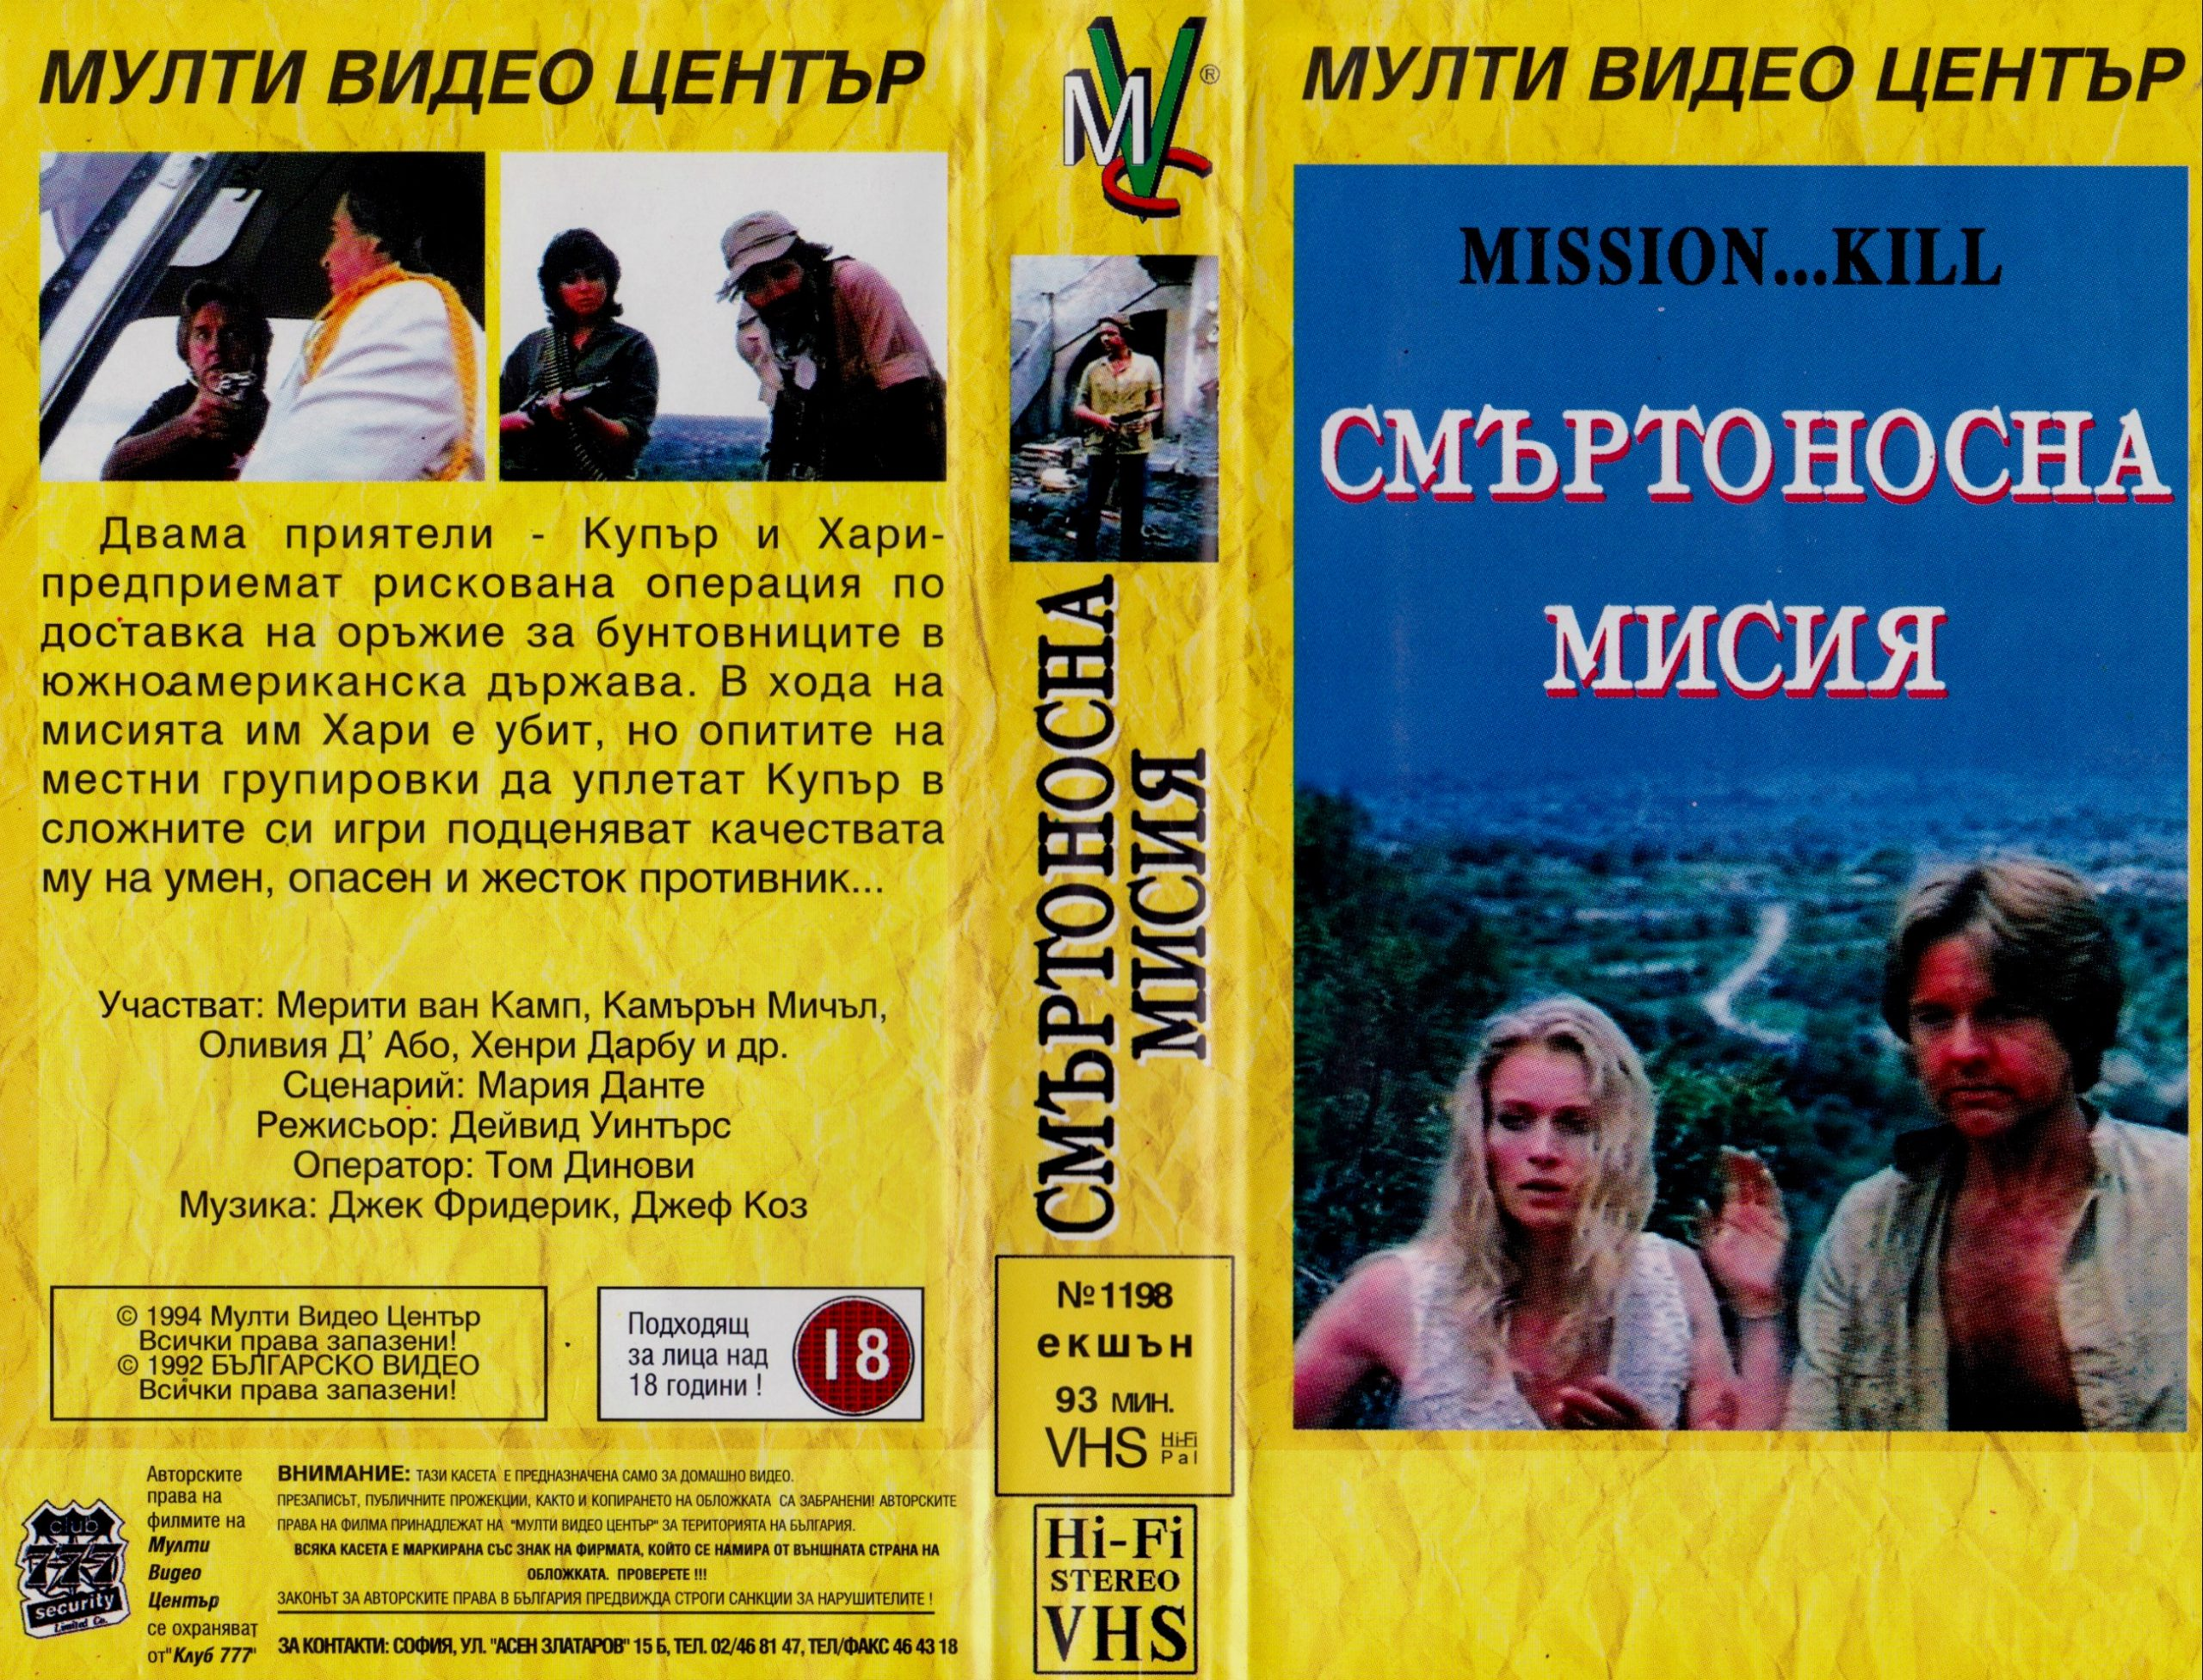 Смъртоносна мисия филм